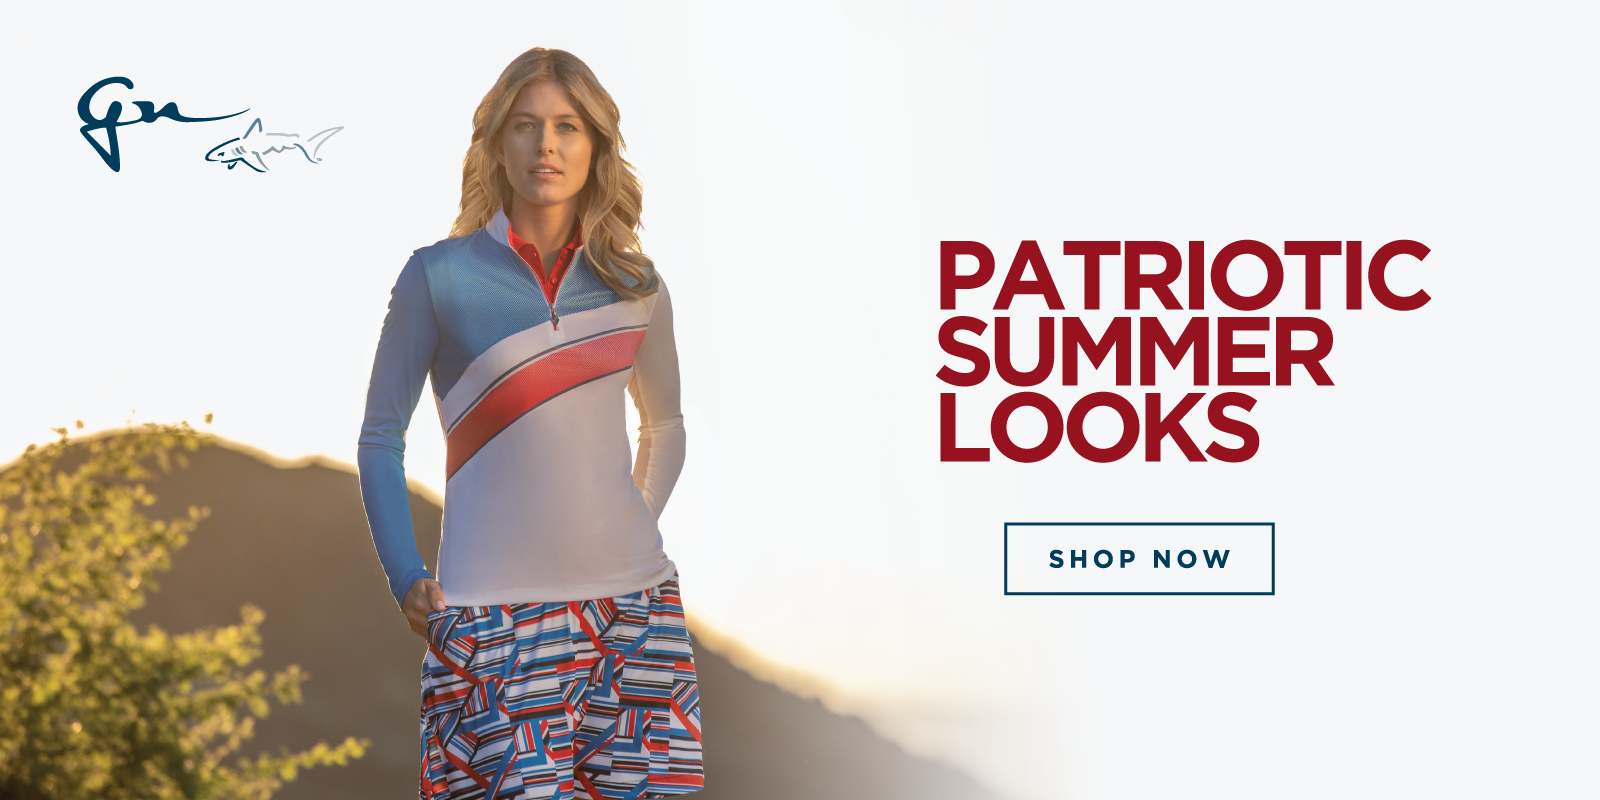 Patriotic Summer Looks Shop Now